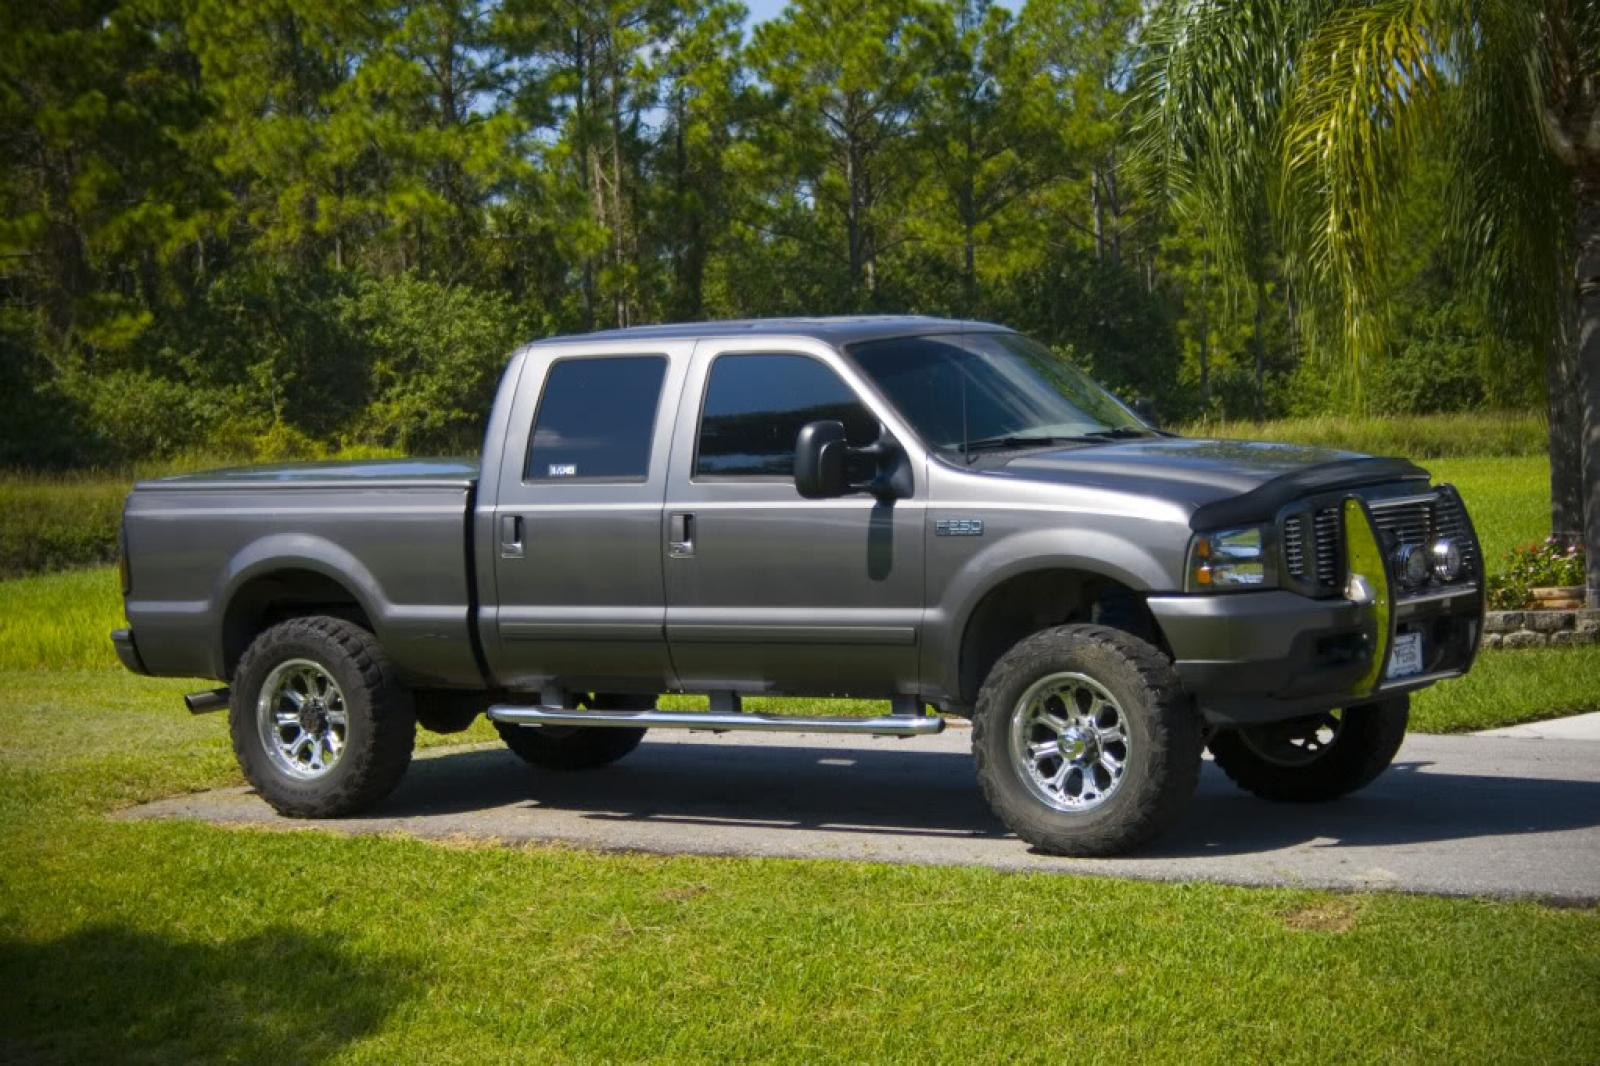 800 1024 1280 1600 origin 2003 ford f 250